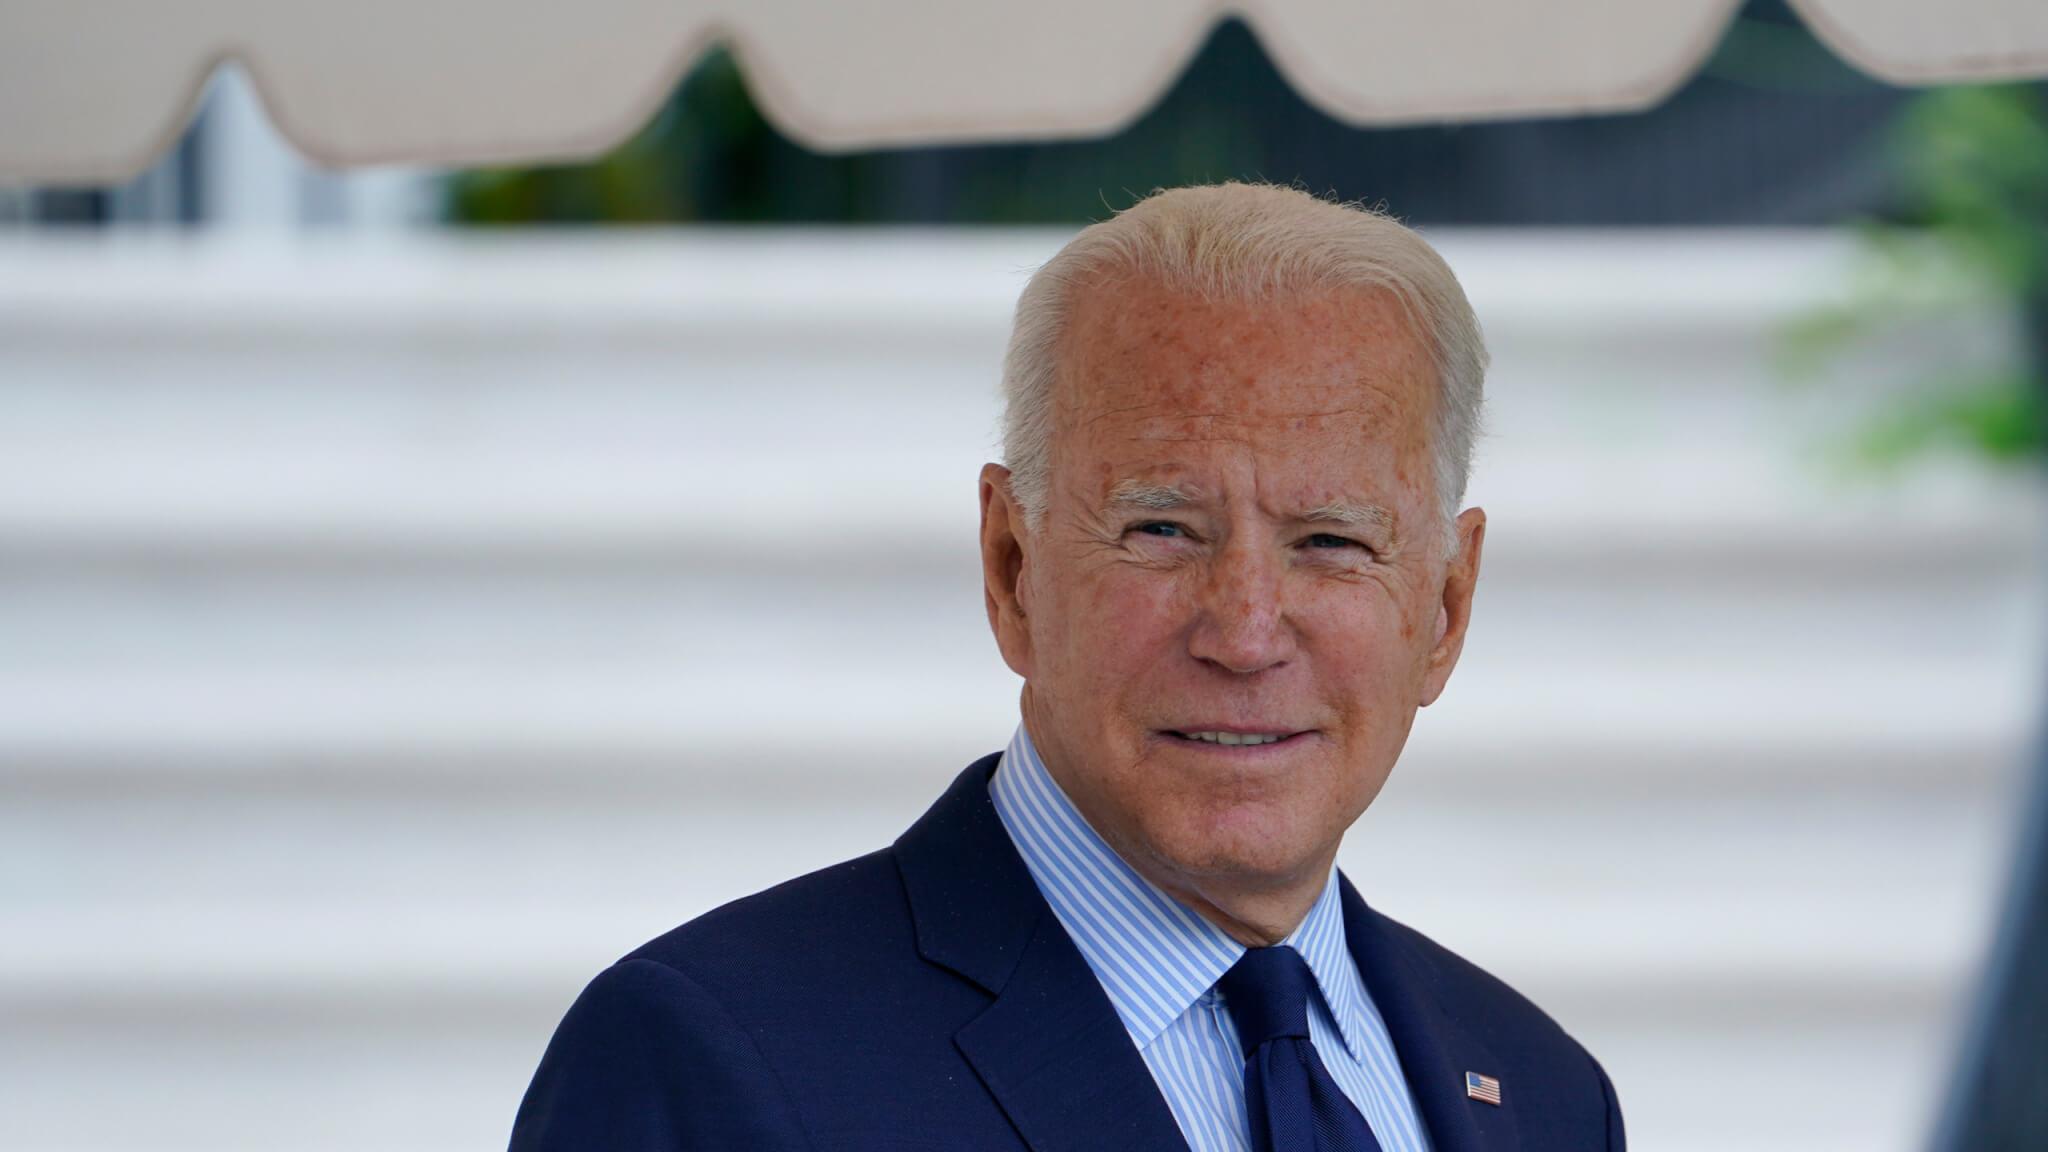 West Virginia urged Biden to outsourcing